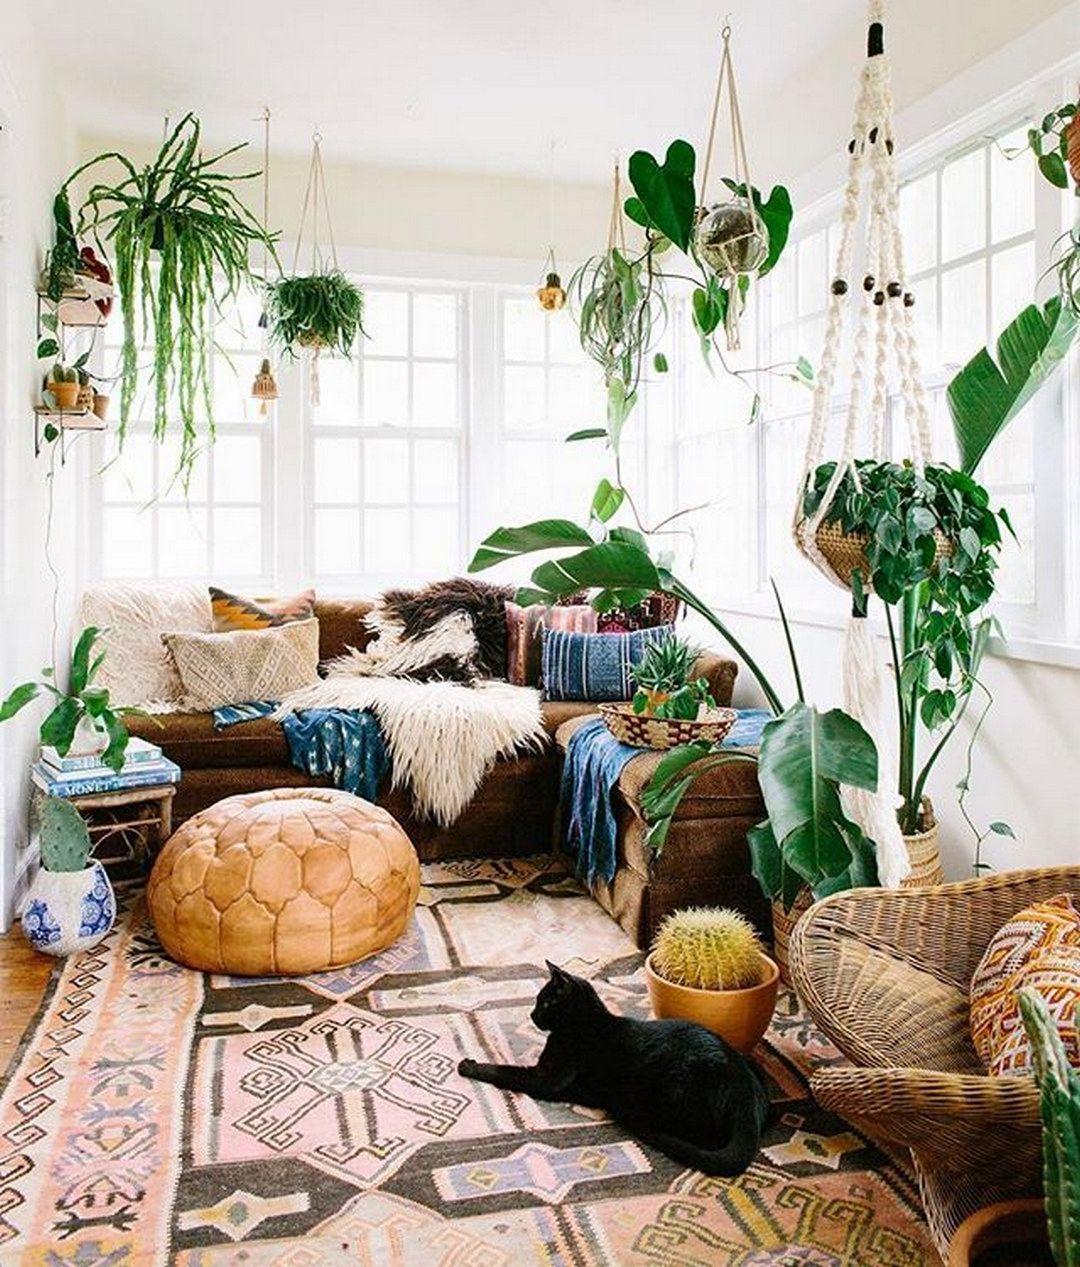 45 Amazing Modern Bohemian Style Bedroom Decor Ideas You Should Check Bohemian Bedroom Decor Bohemian Style Decor Decor